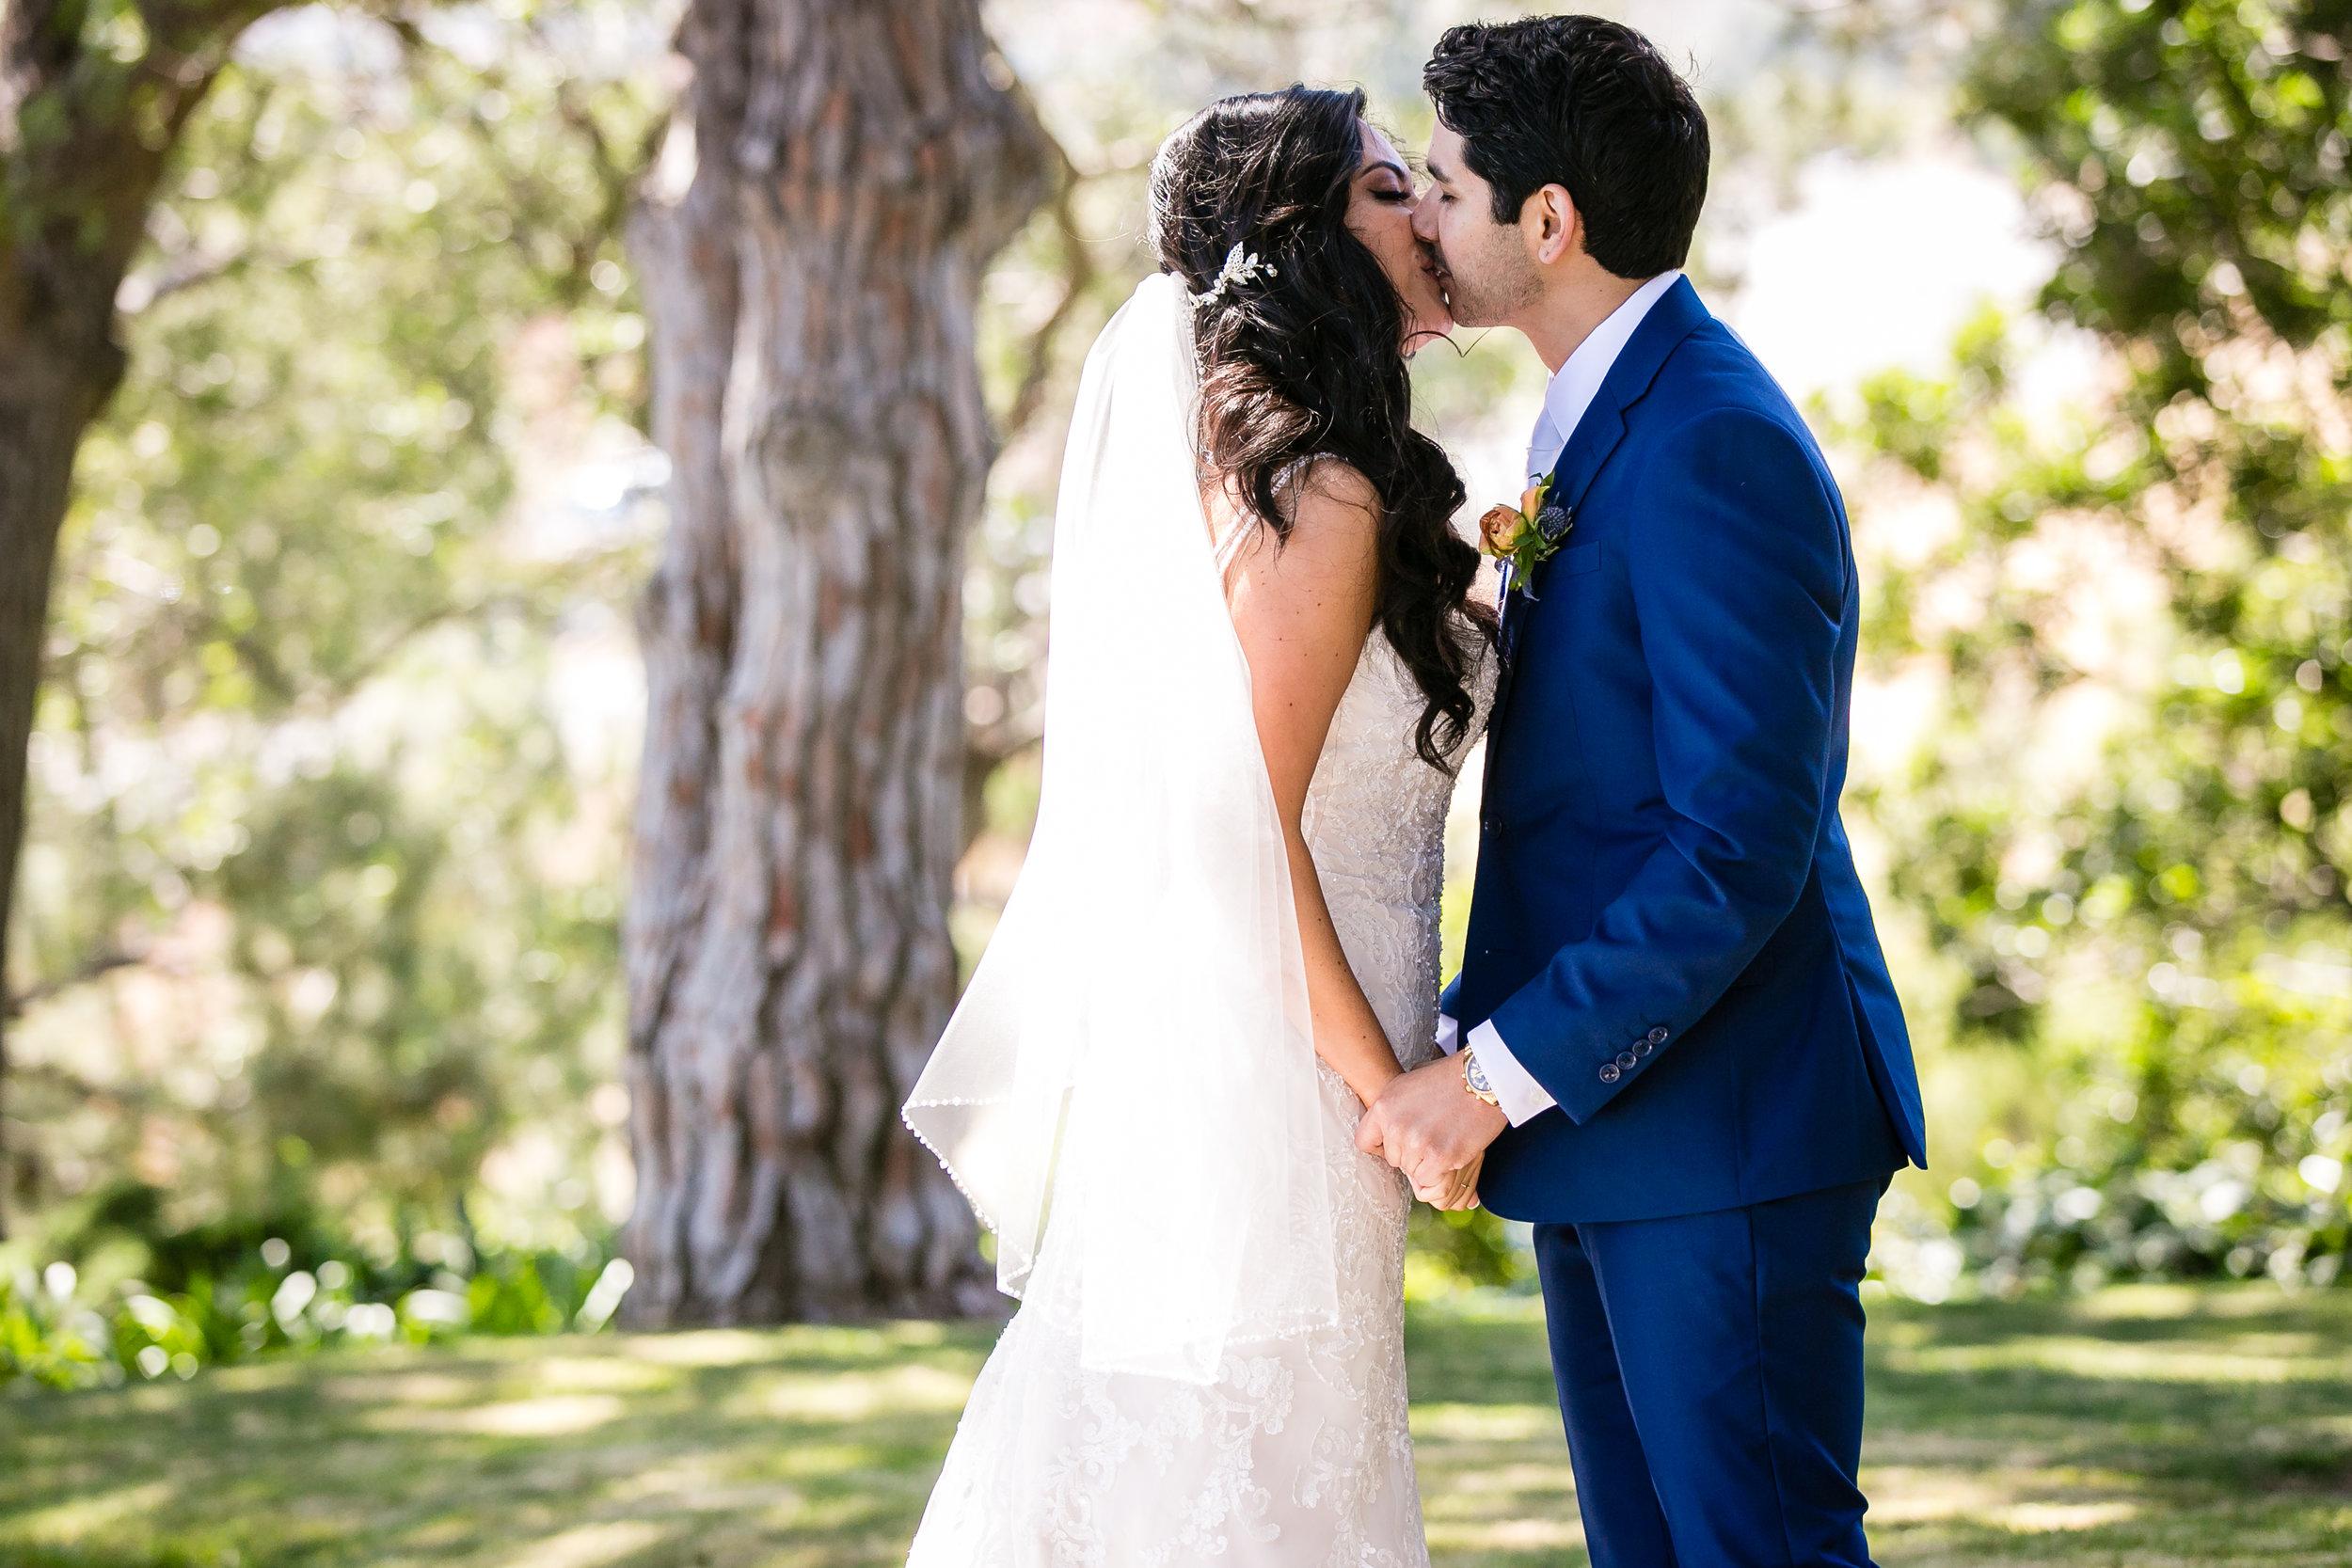 2019_05_24_Wedding_Barajas_0336.jpg